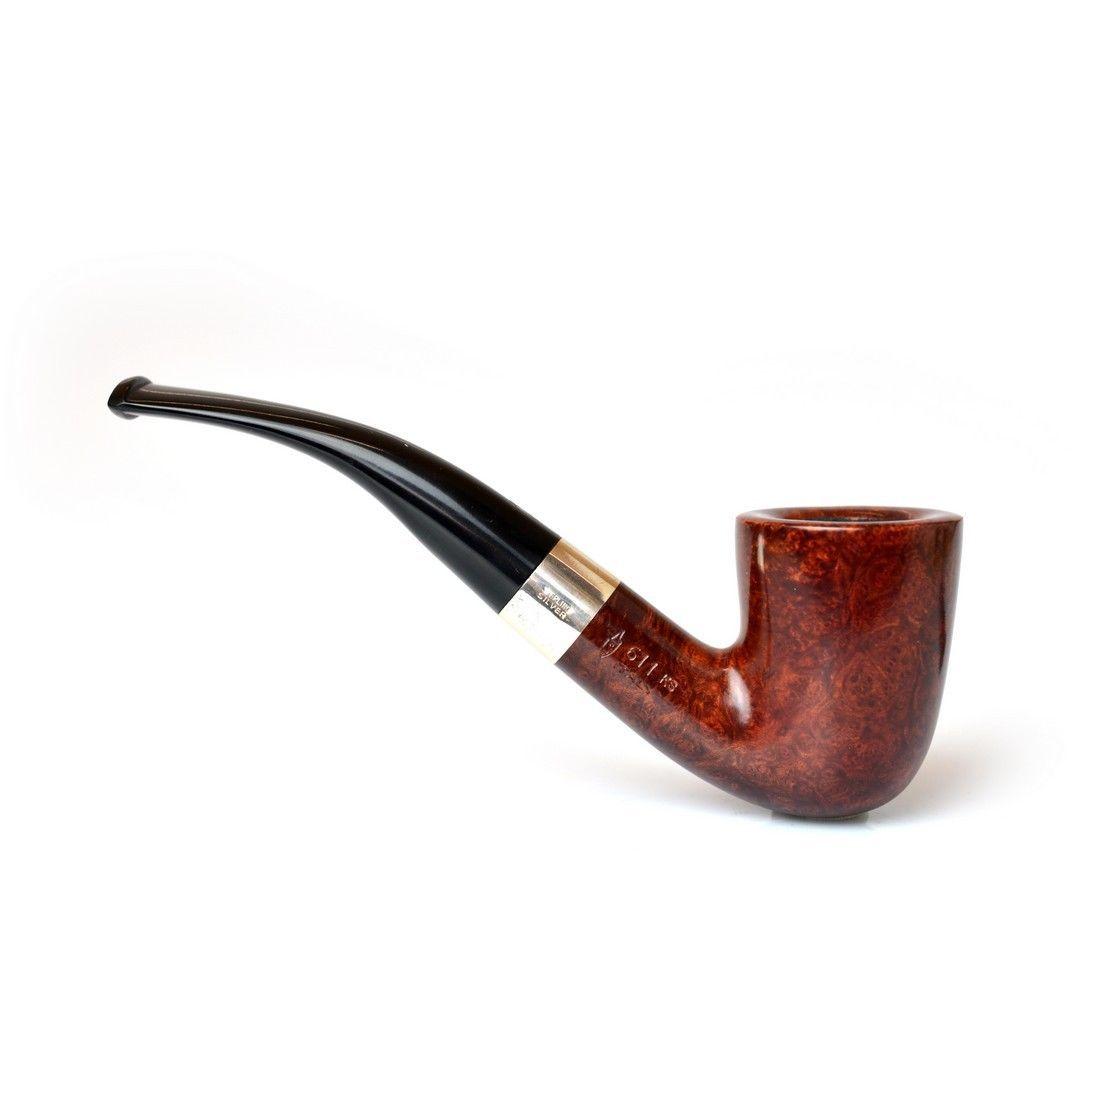 Pipa Savinelli Silver liscia 611ks 611 ks curva italian briar pipe ...